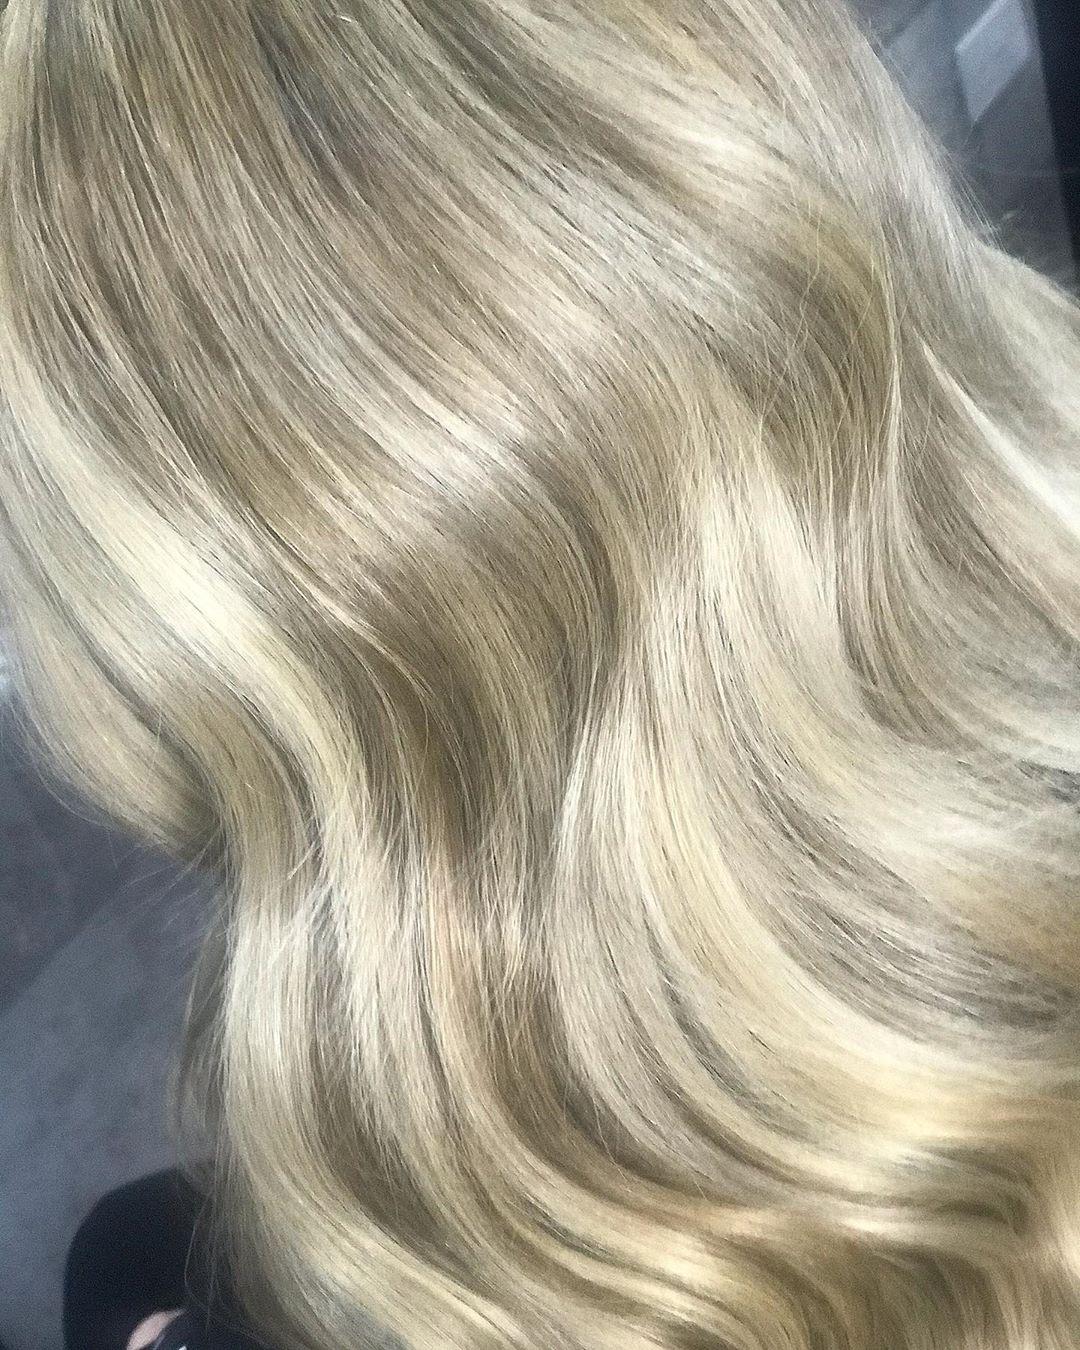 Wavy blonde hair with brown lowlights